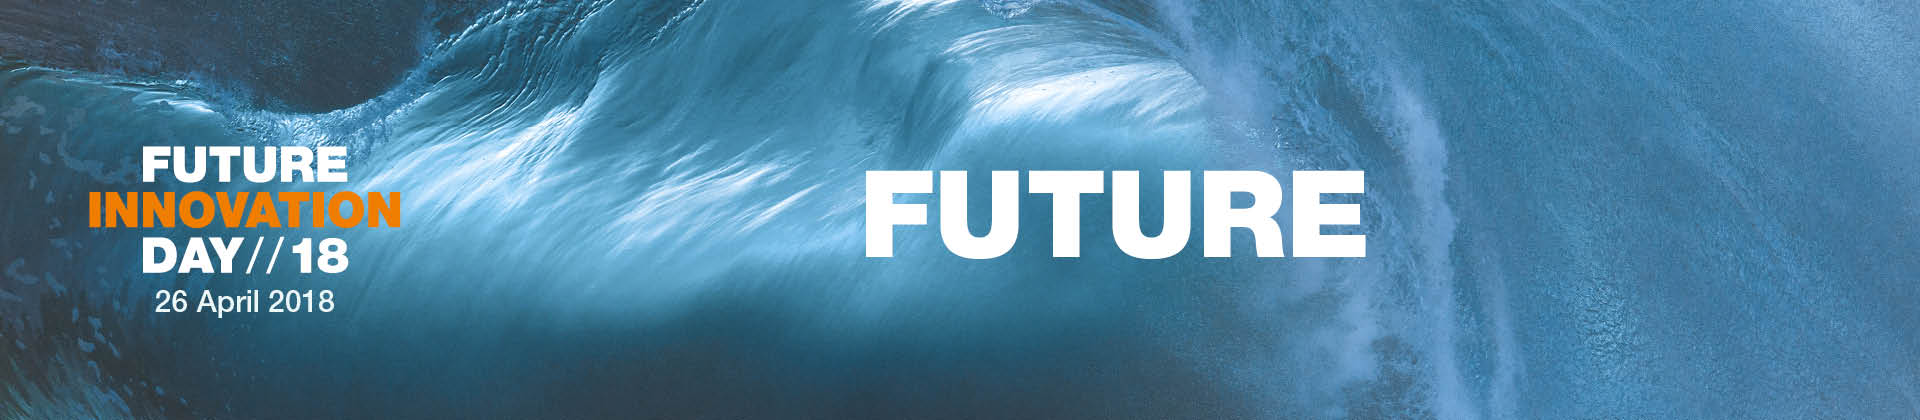 Future Innovation Project - FUTURE